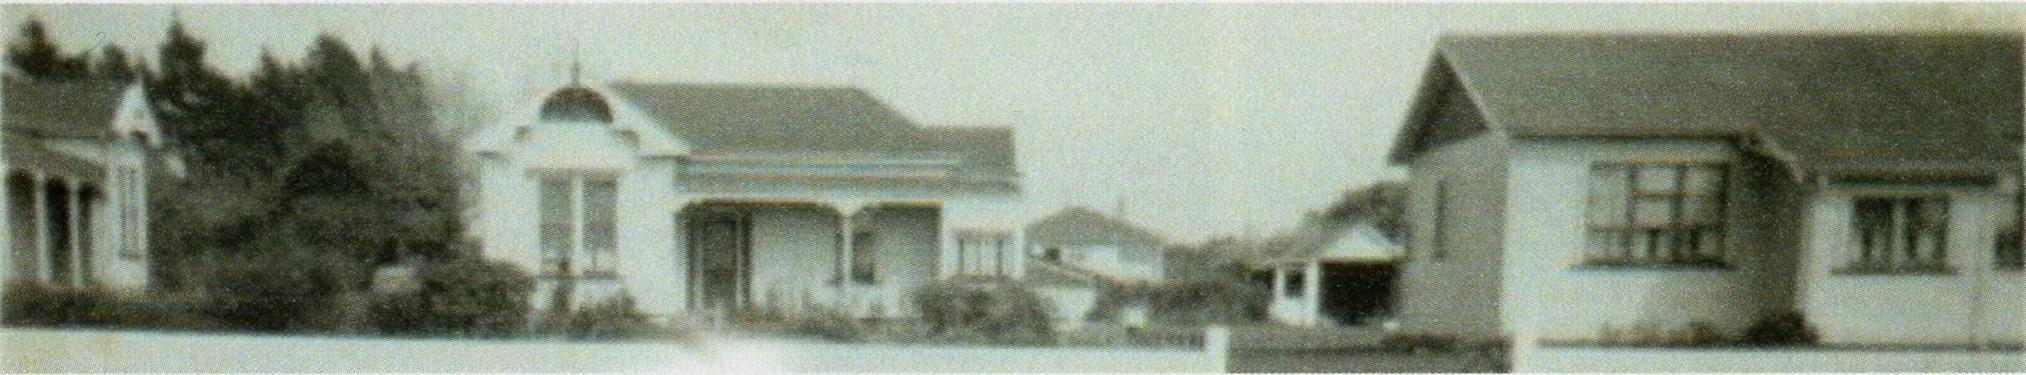 A narrow shot of  the three houses